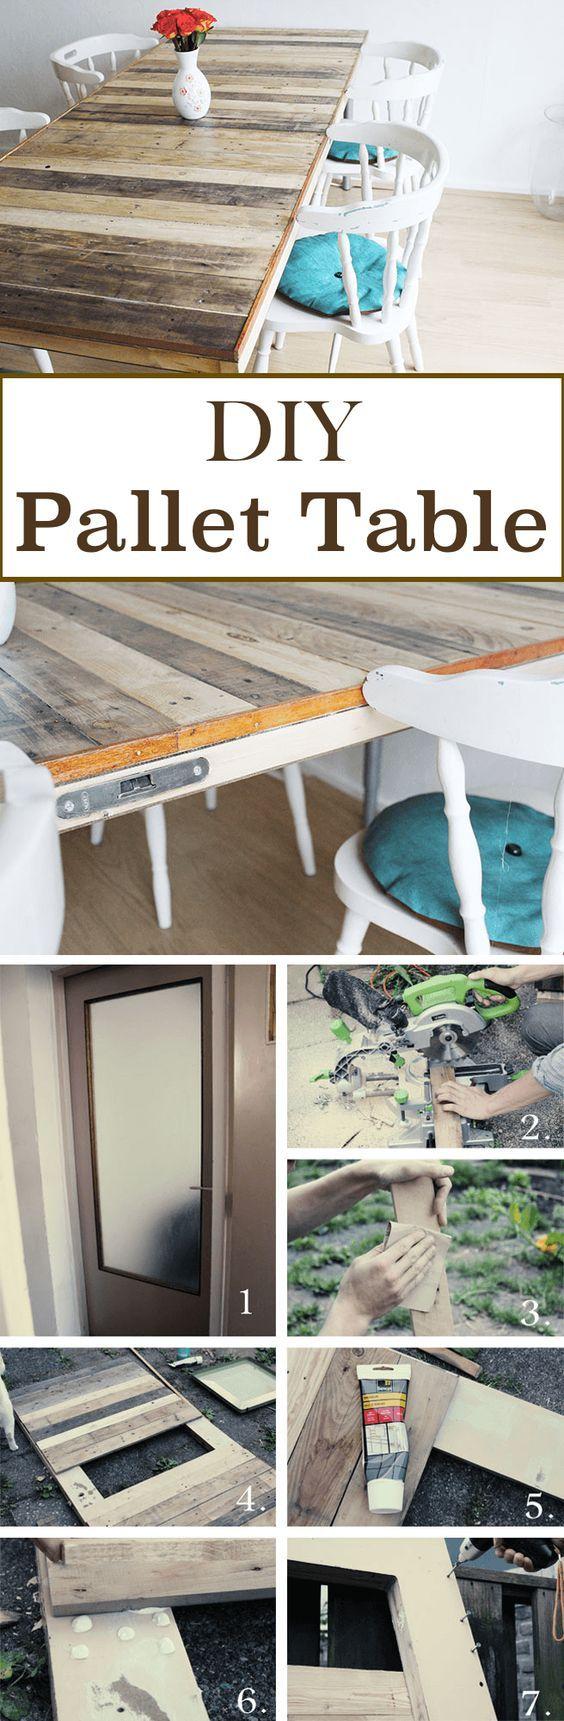 18 best DIY Wood images on Pinterest | Diy holz, Ananas und Bastelei